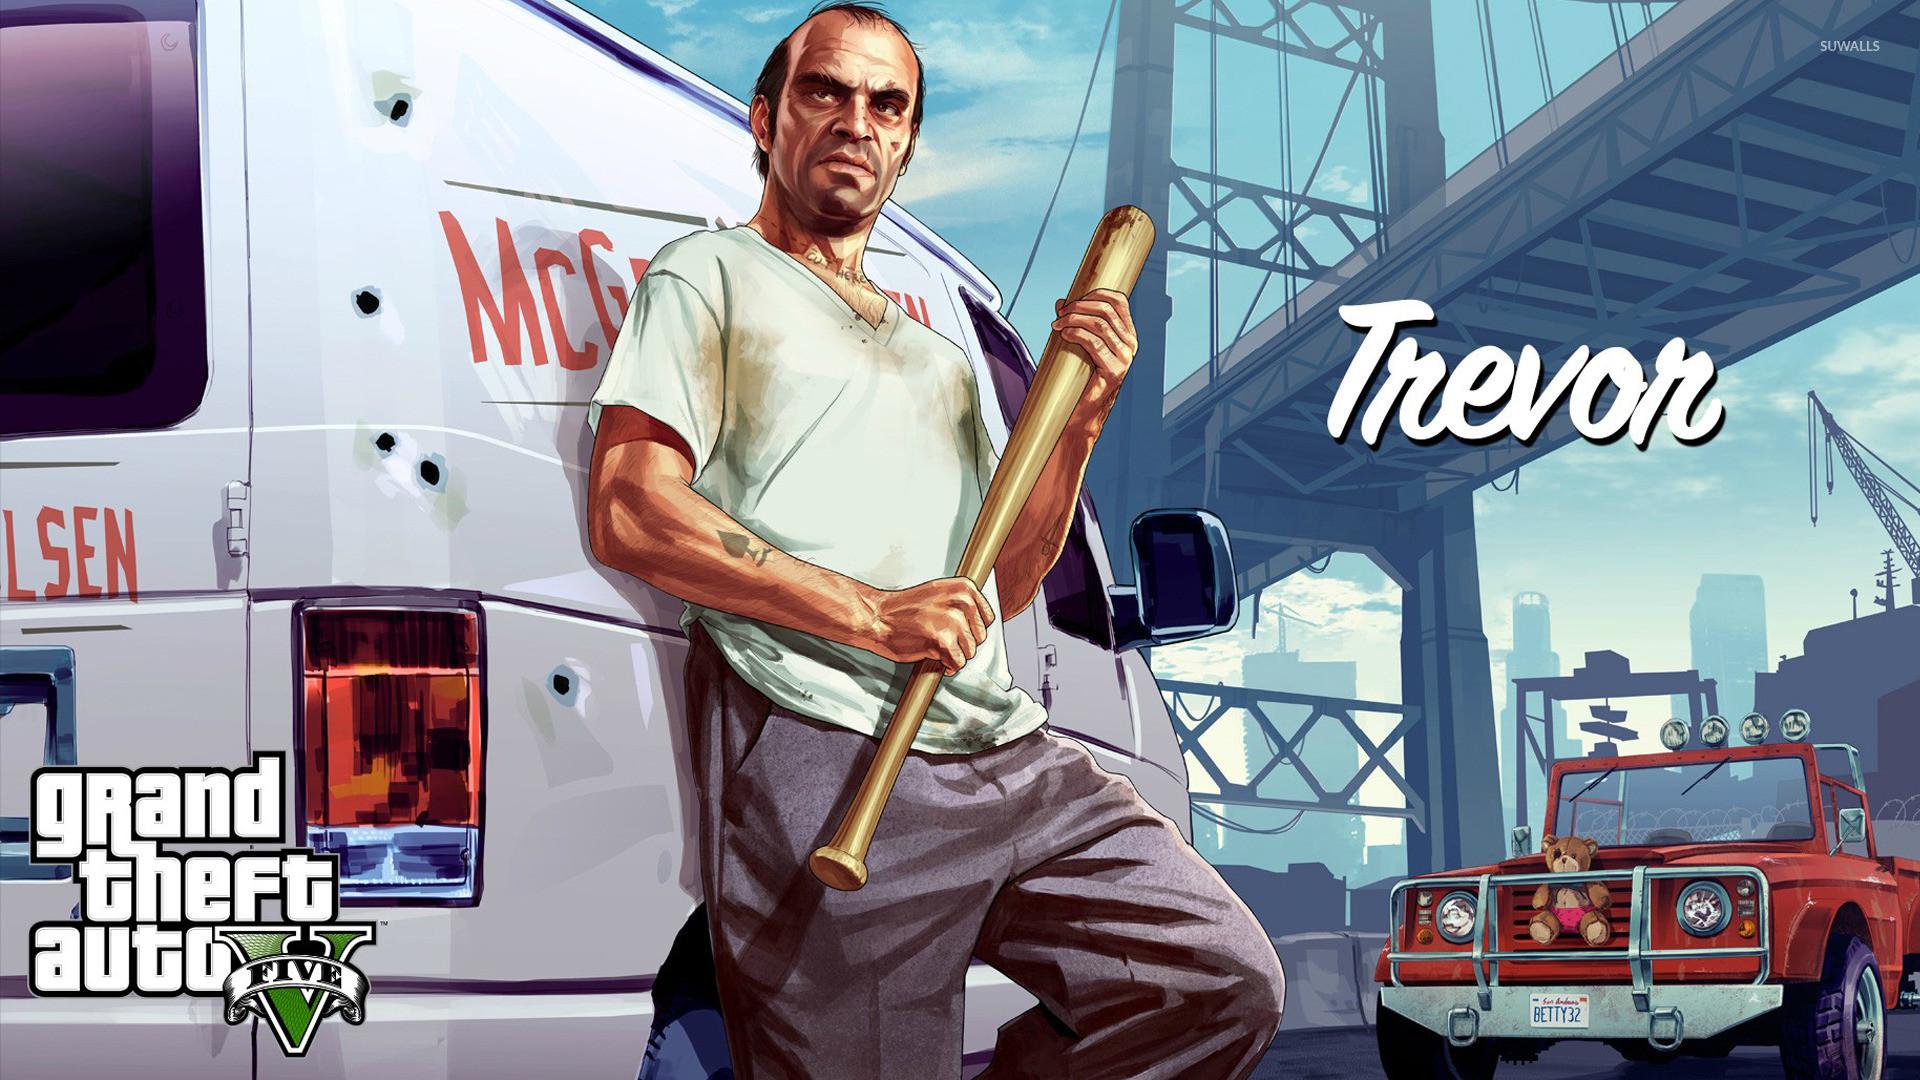 Trevor – Grand Theft Auto V wallpaper jpg